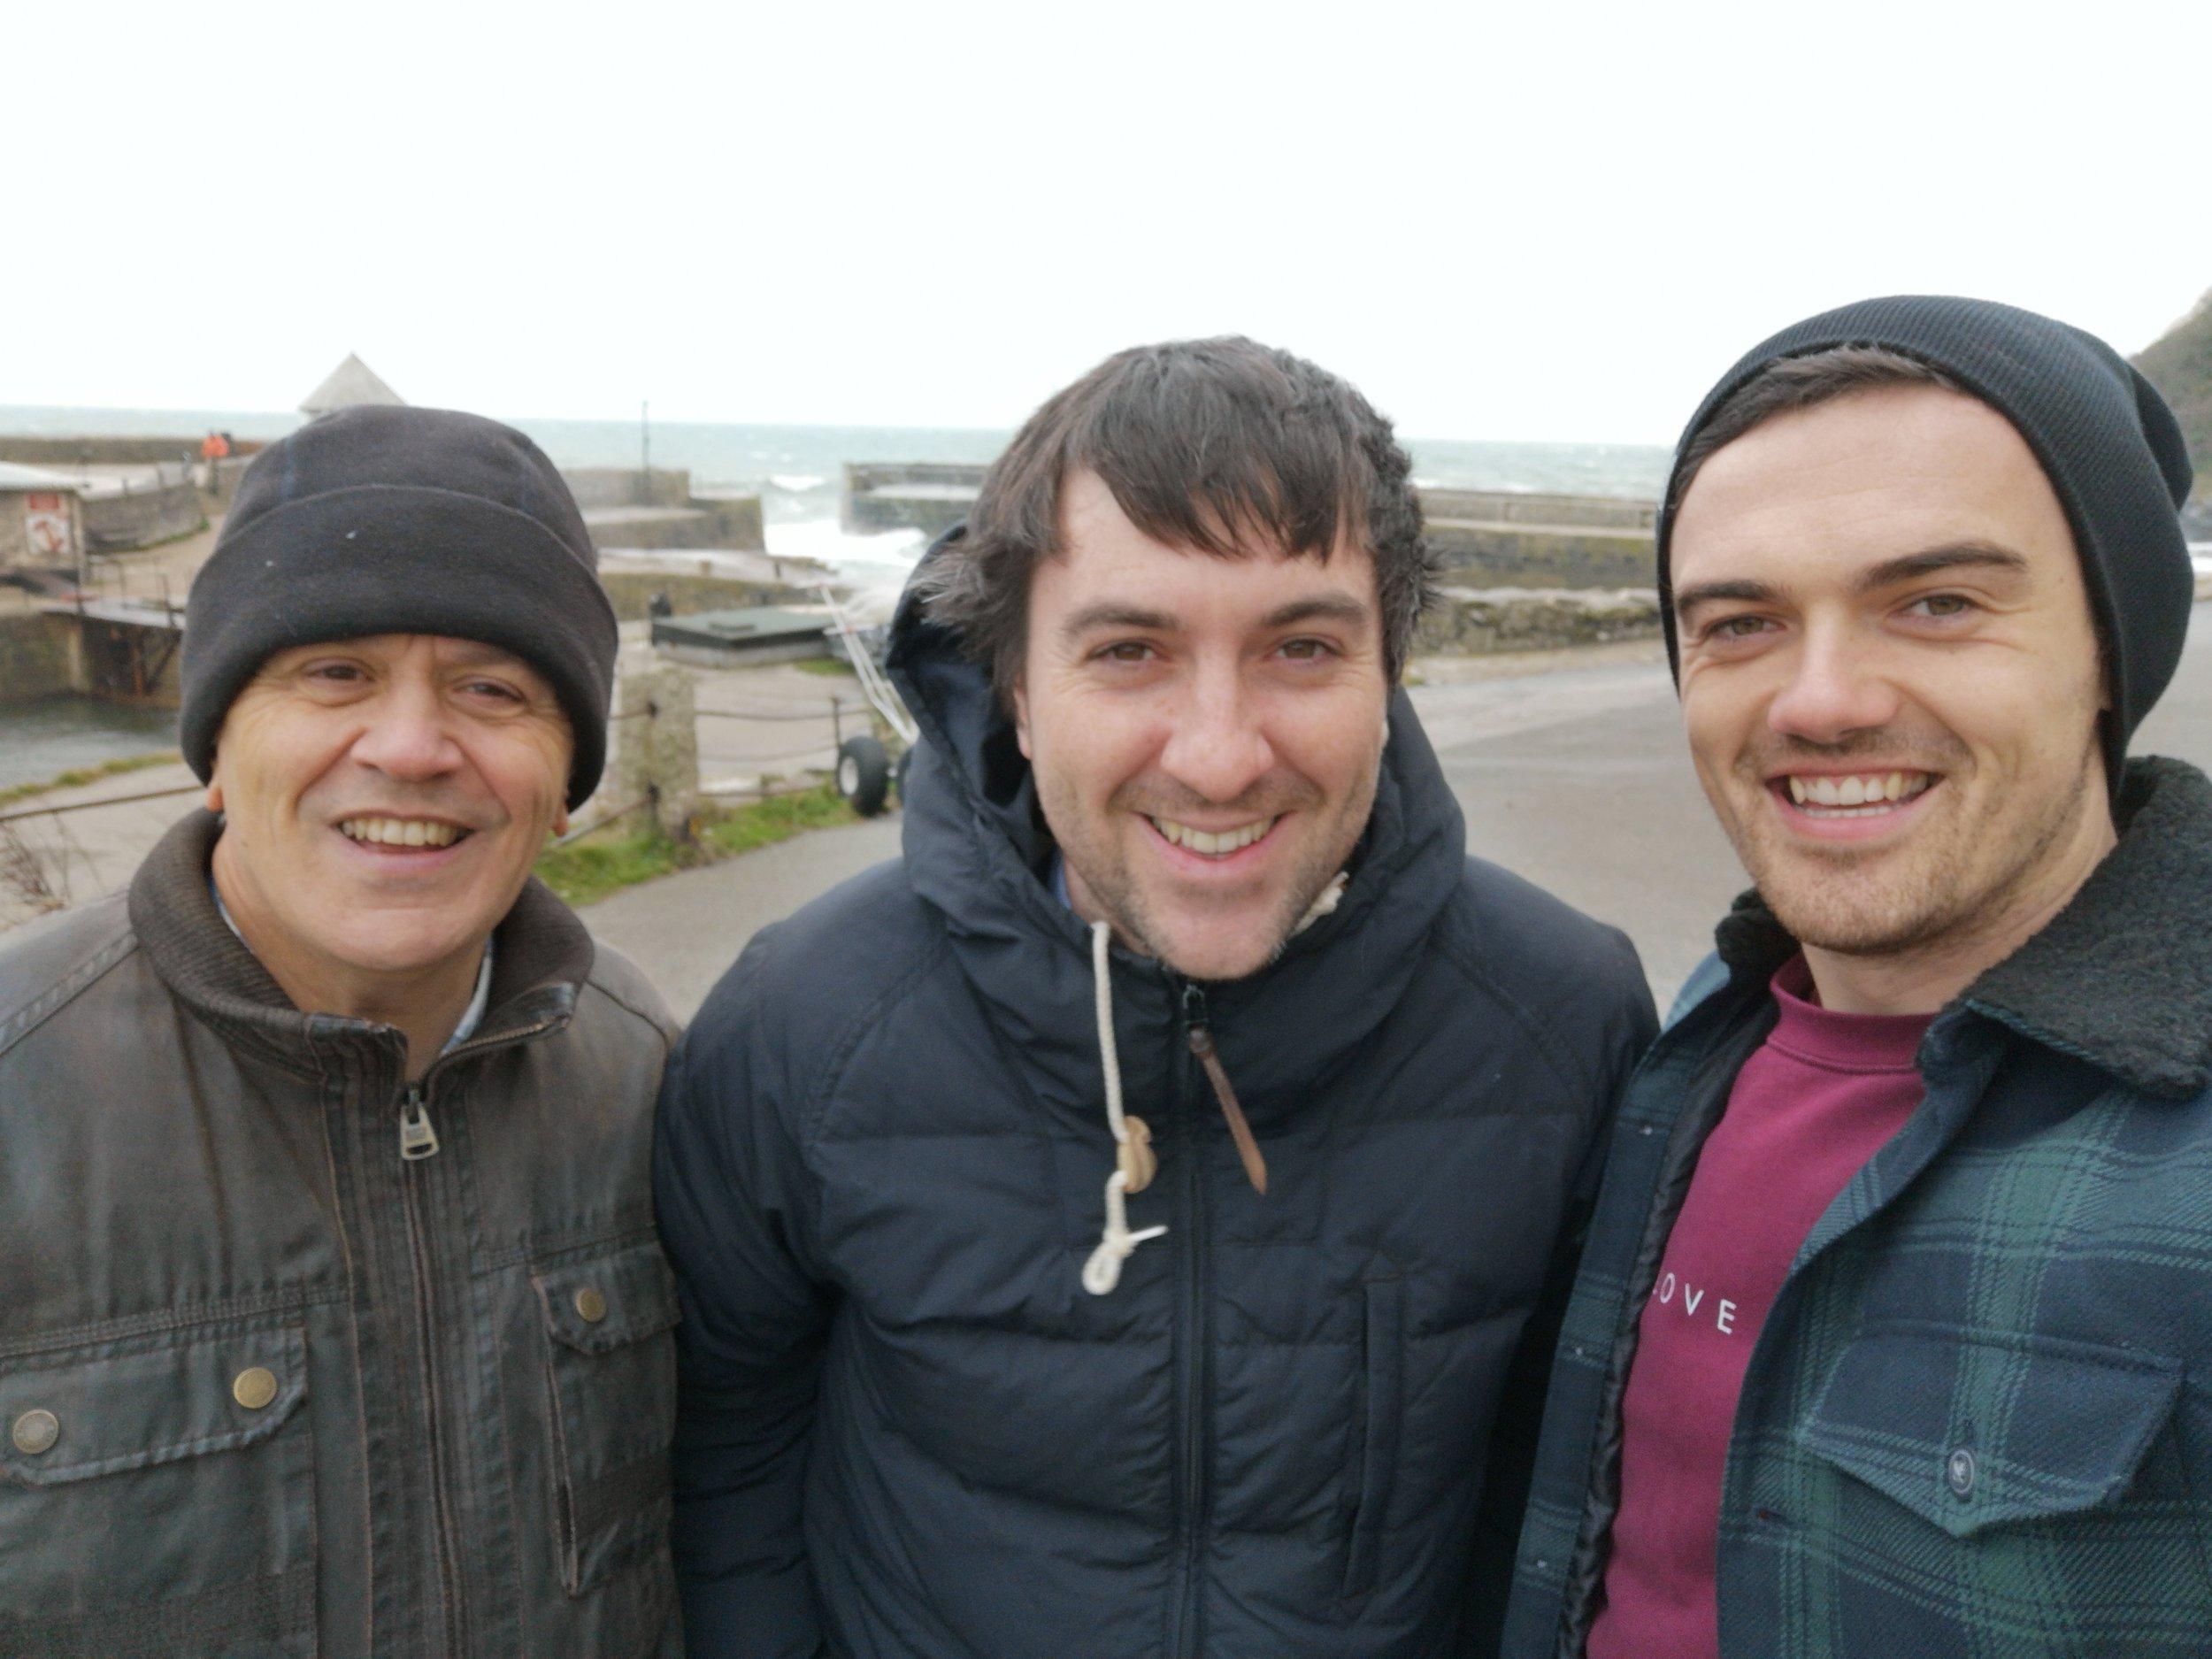 Adrian Barnard - Content Manager (L),  Marcus Jones - Head of News (C),  Liam Flint - Digital Media Manager (R)